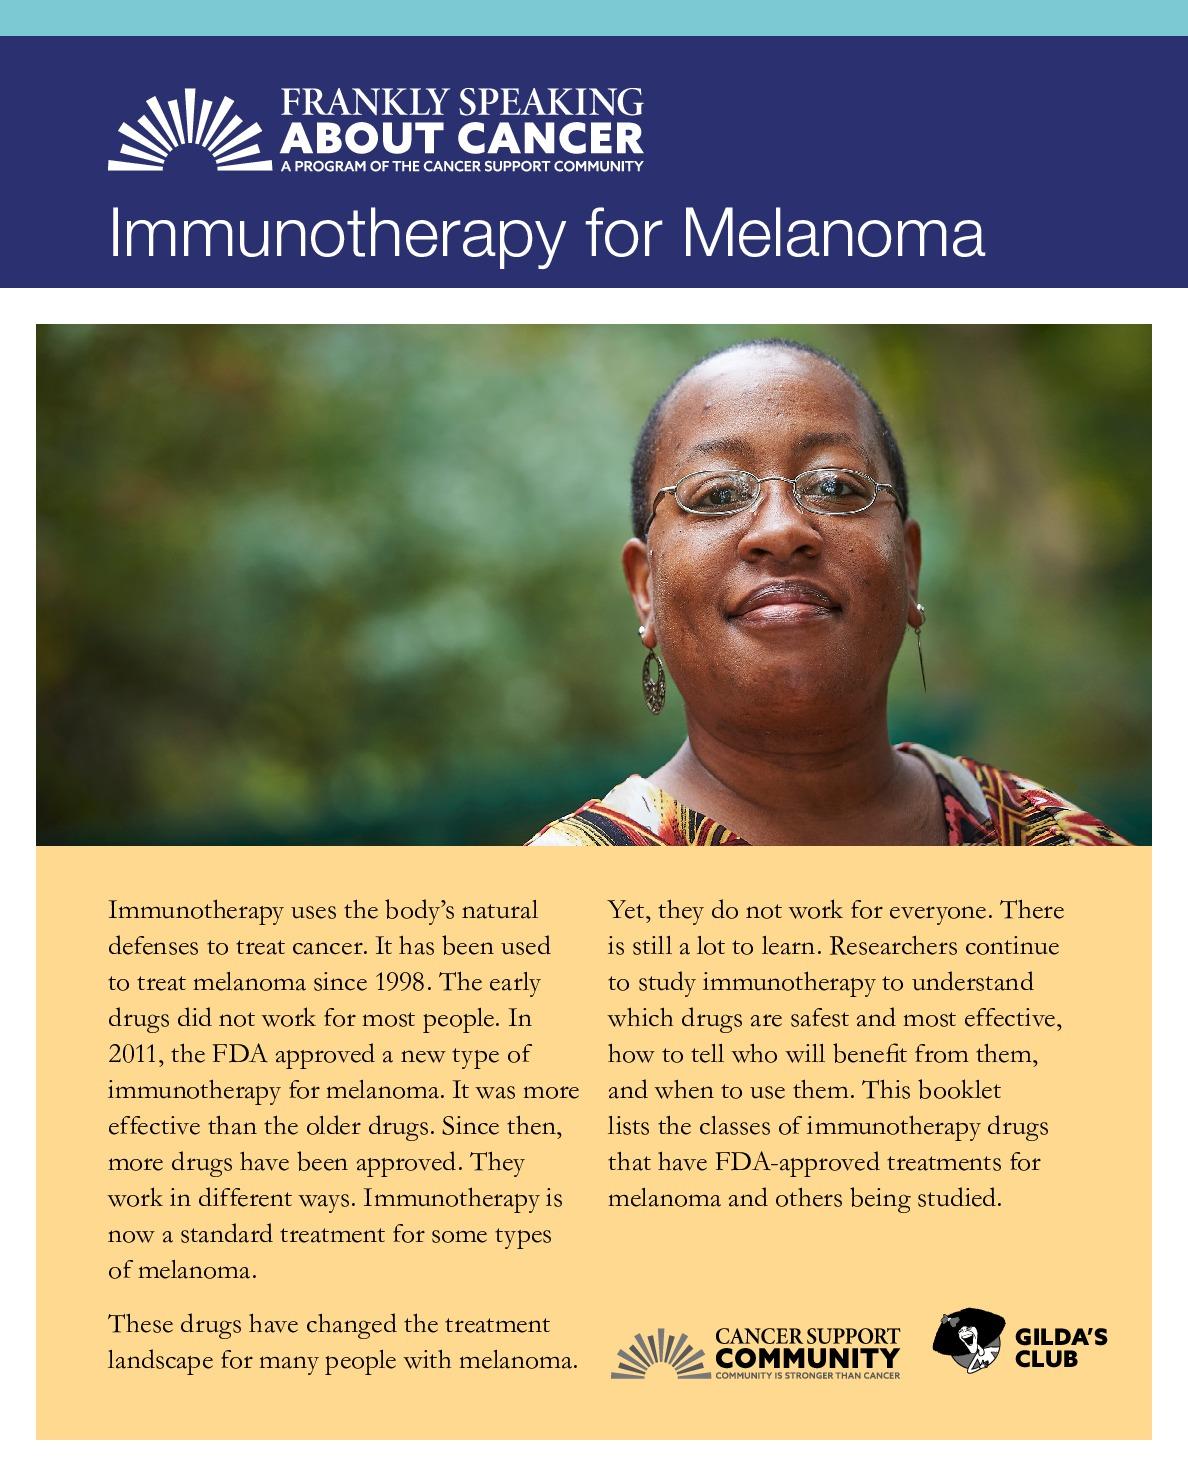 Immunotherapy for Melanoma